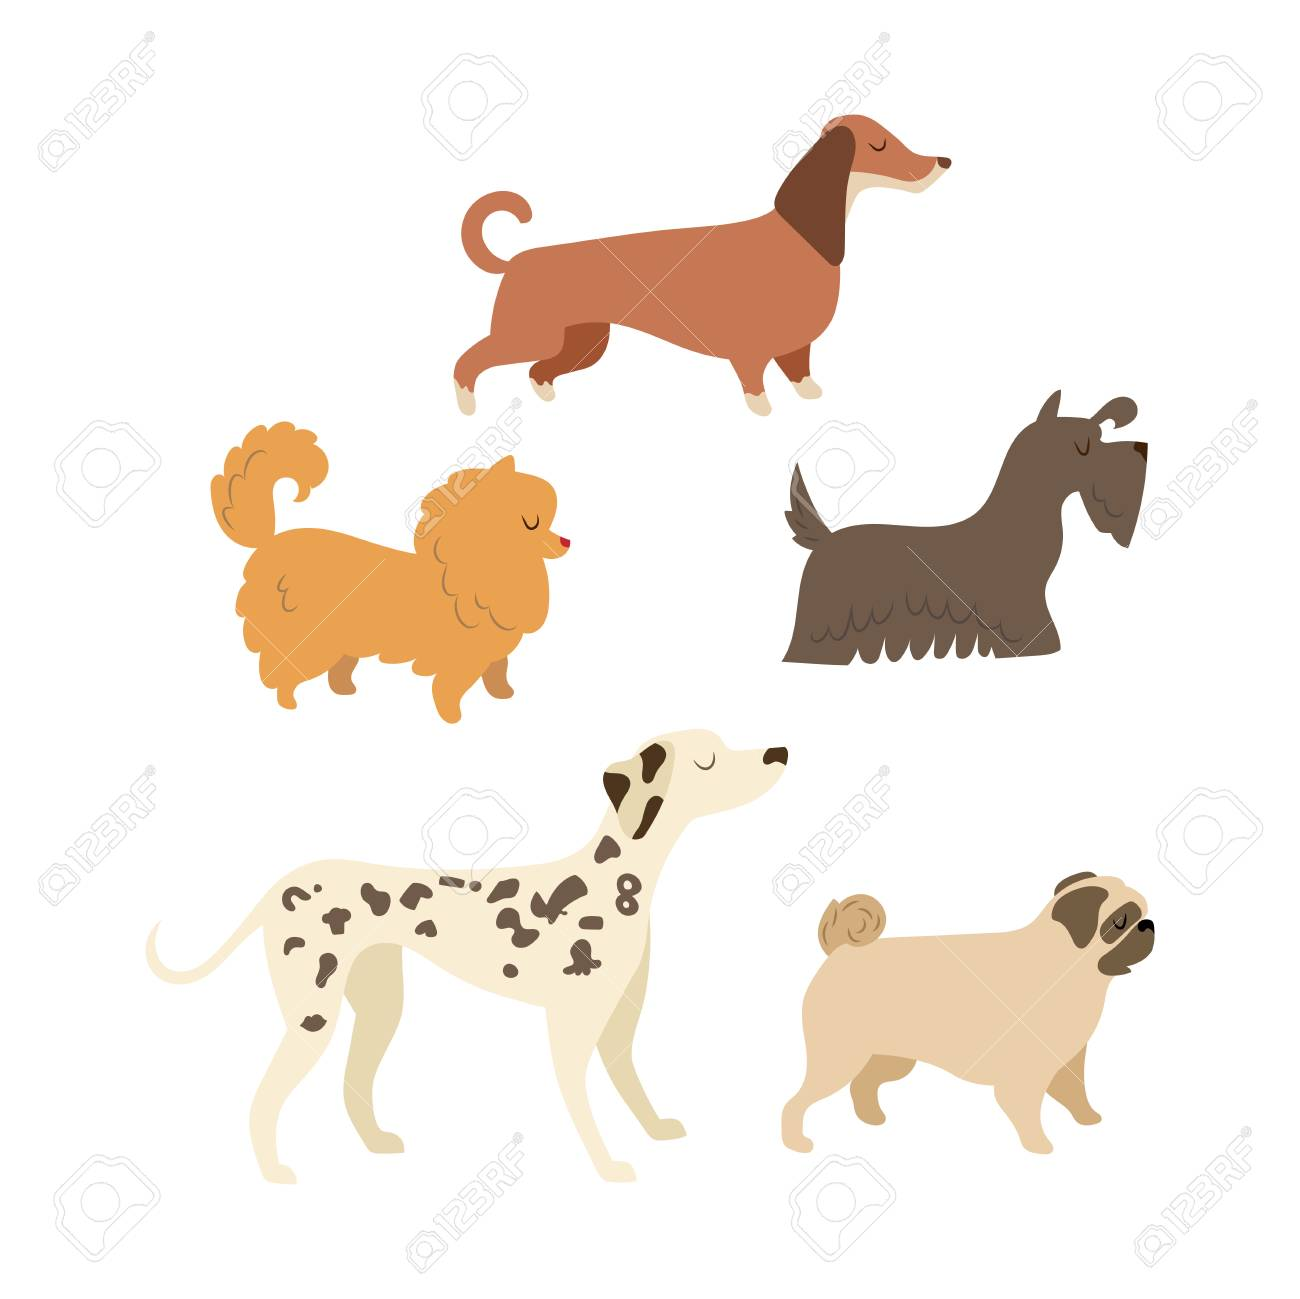 Cartoon Dog Illustration Collection 2018 Dog Symbol Royalty Free Cliparts Vectors And Stock Illustration Image 88261037